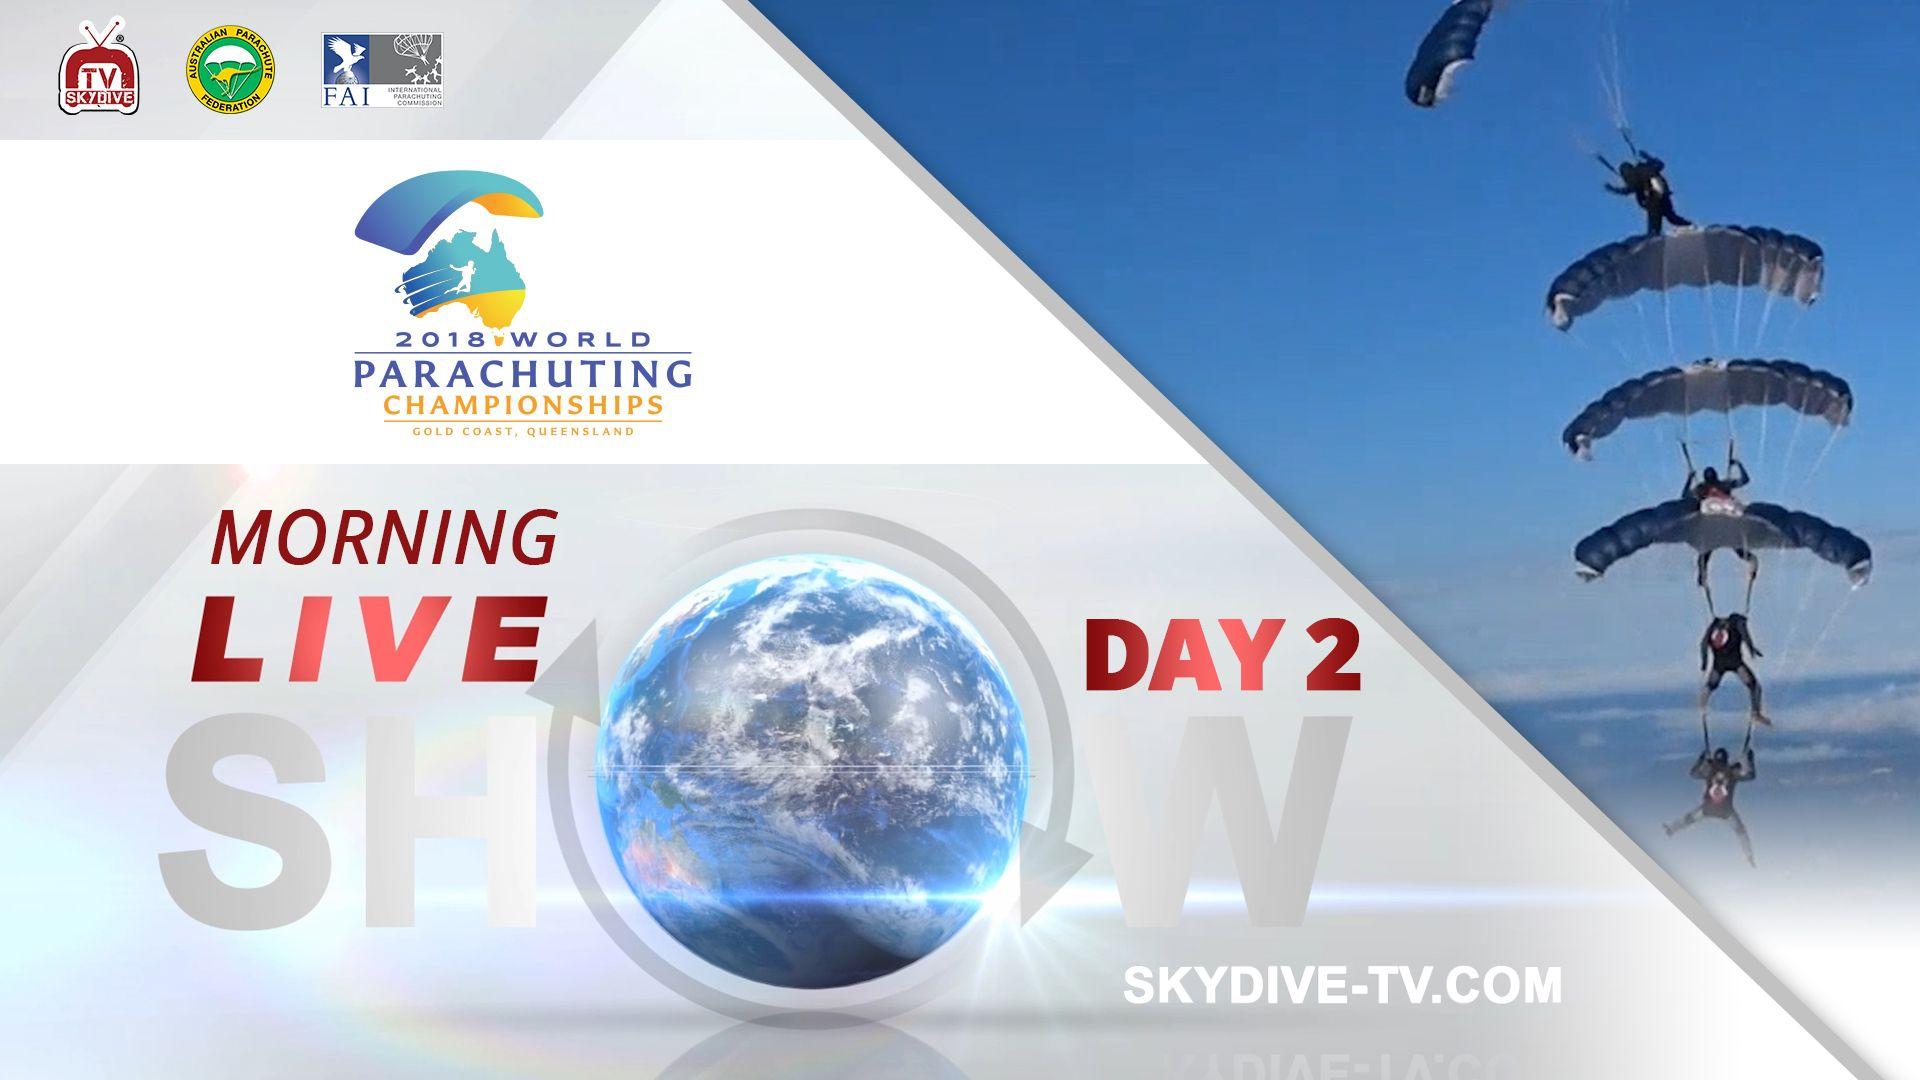 Live Show Morning Day 2 2018 World Parachuting Championships Australia Skydiving Parachute Live